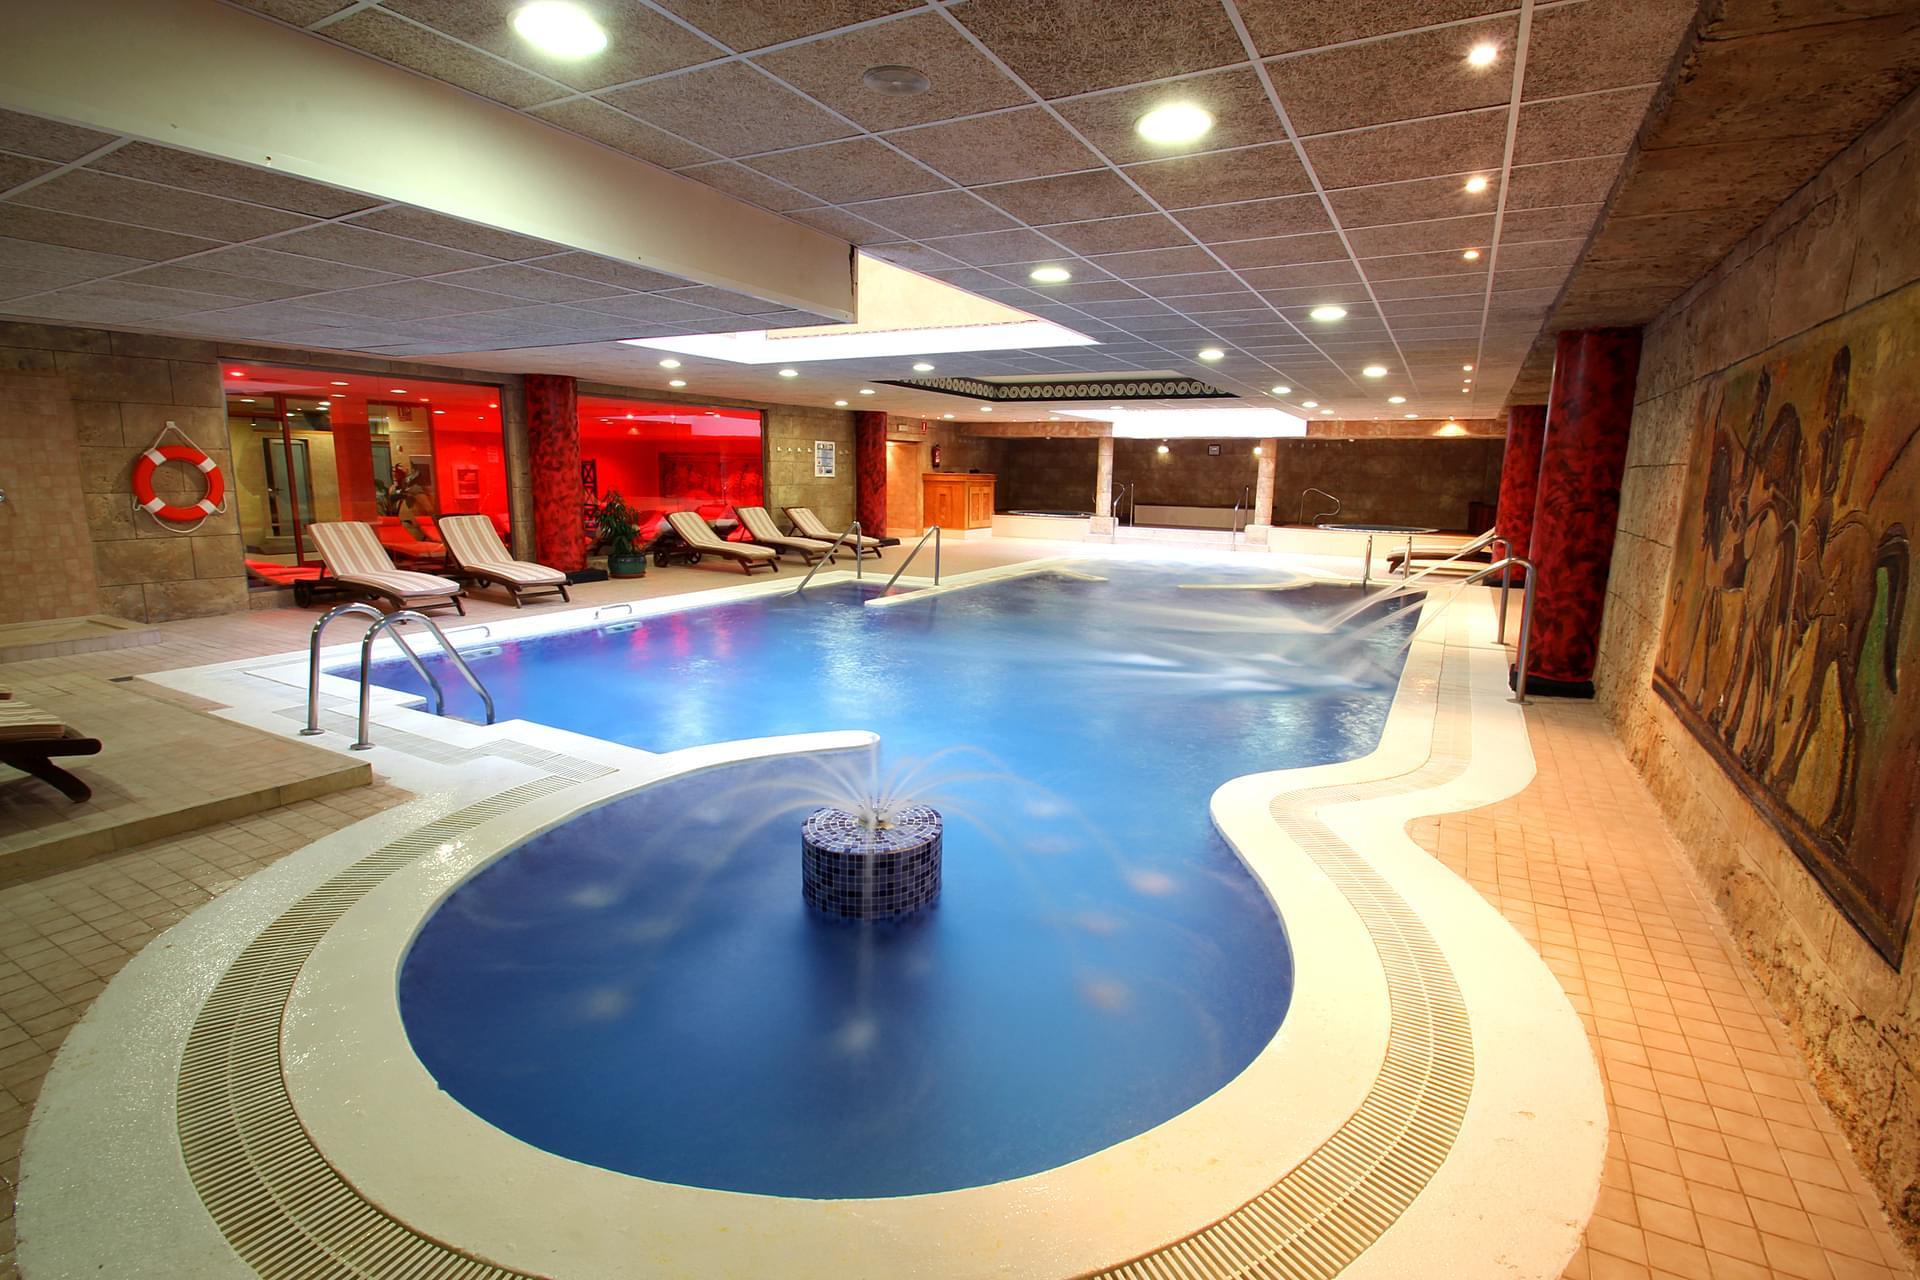 Resort h tel spa pe scola plaza 4 suites pe iscola - Spa en castellon ...